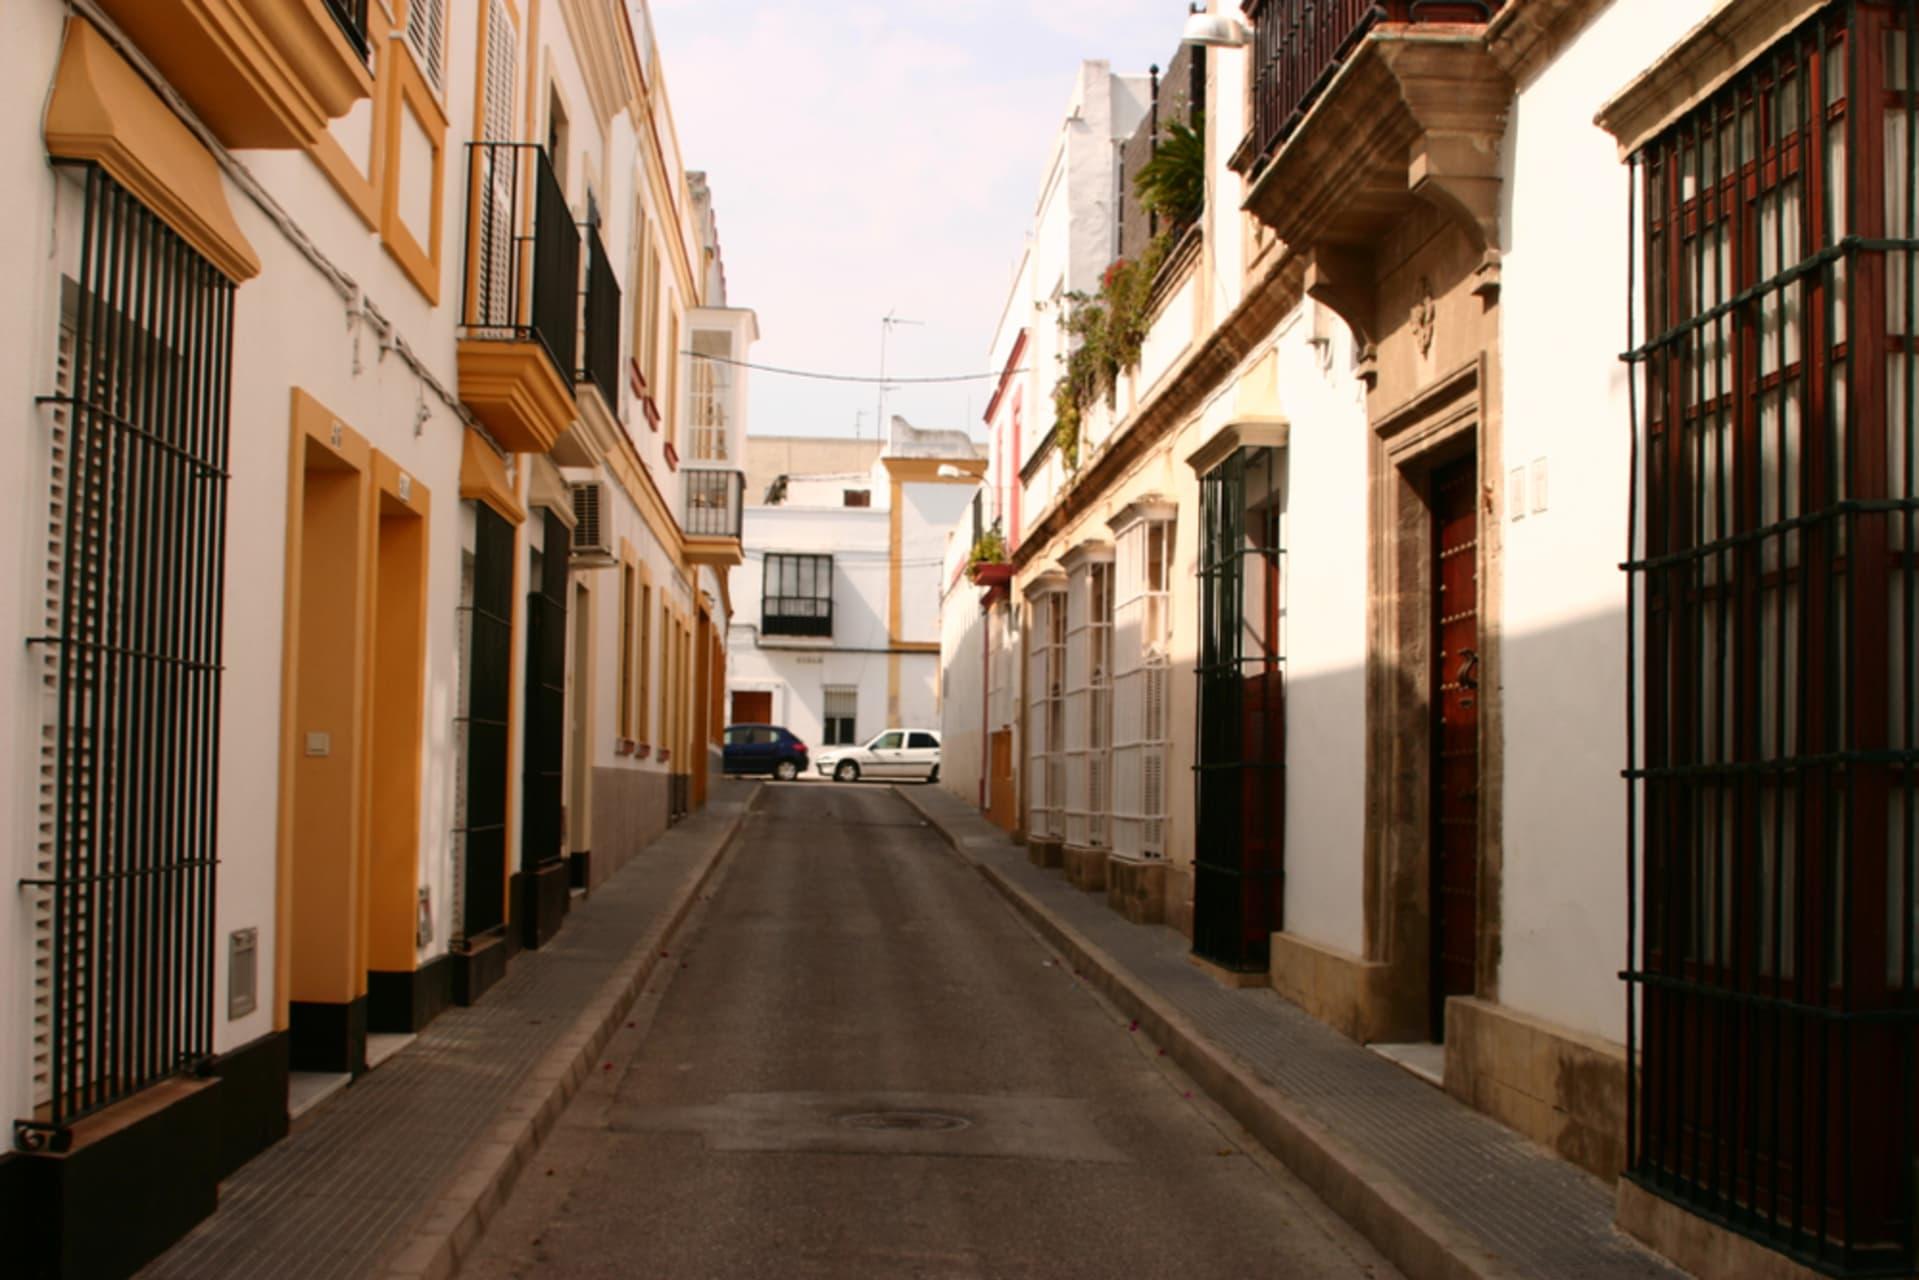 Cádiz - Puerto de Santa Maria.  The city where the first map of The New World was made.